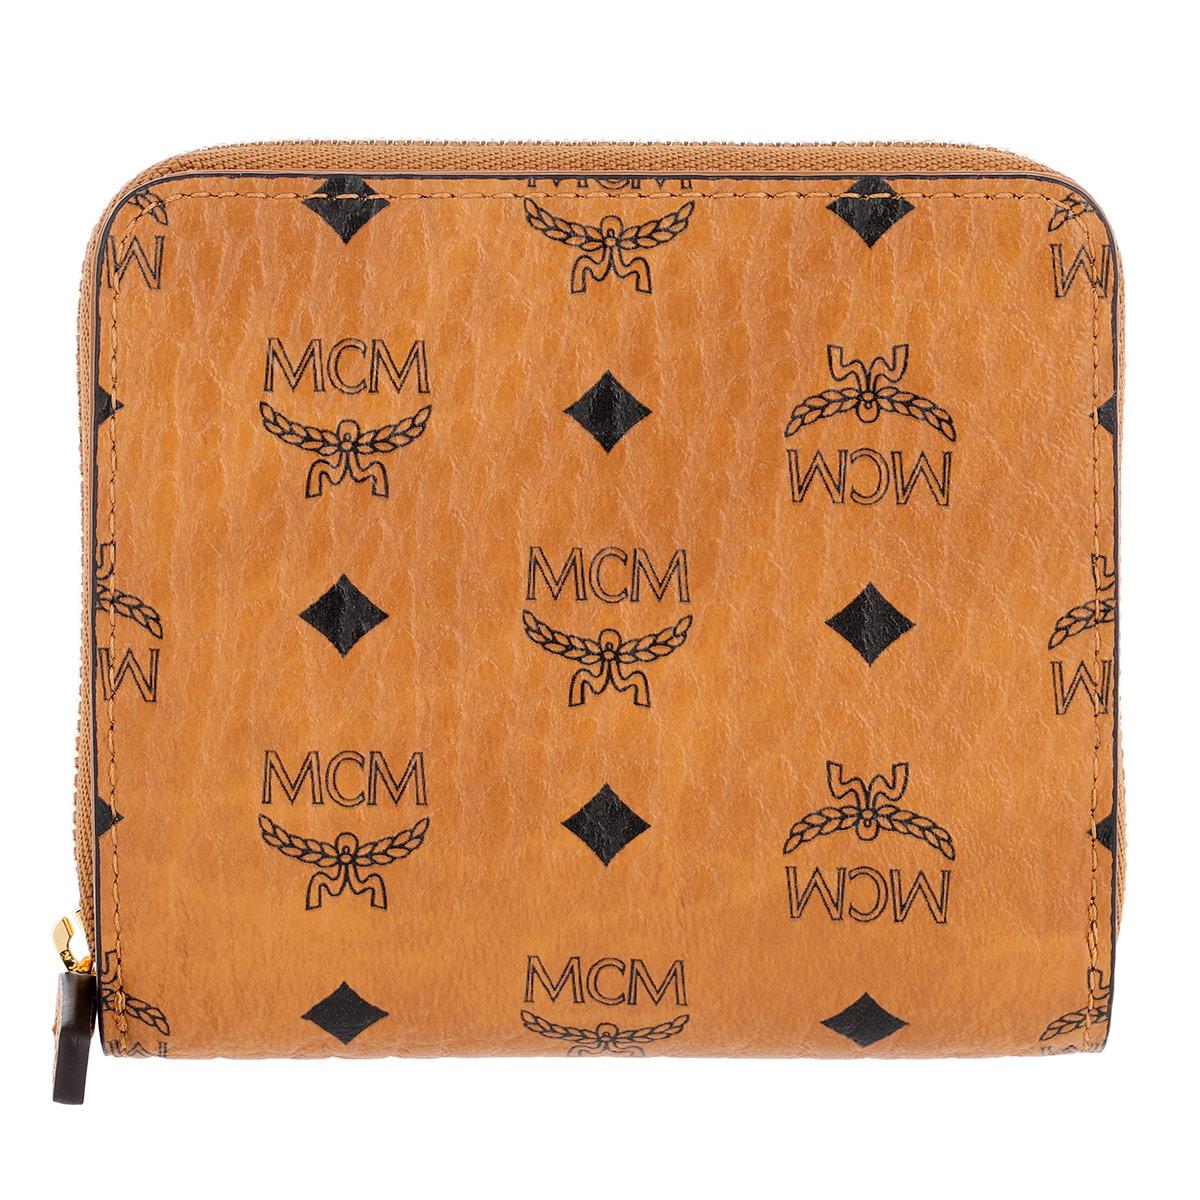 MCM Portemonnaie - Visetos Original Zip Wallet Mini Cognac - in cognac - für Damen